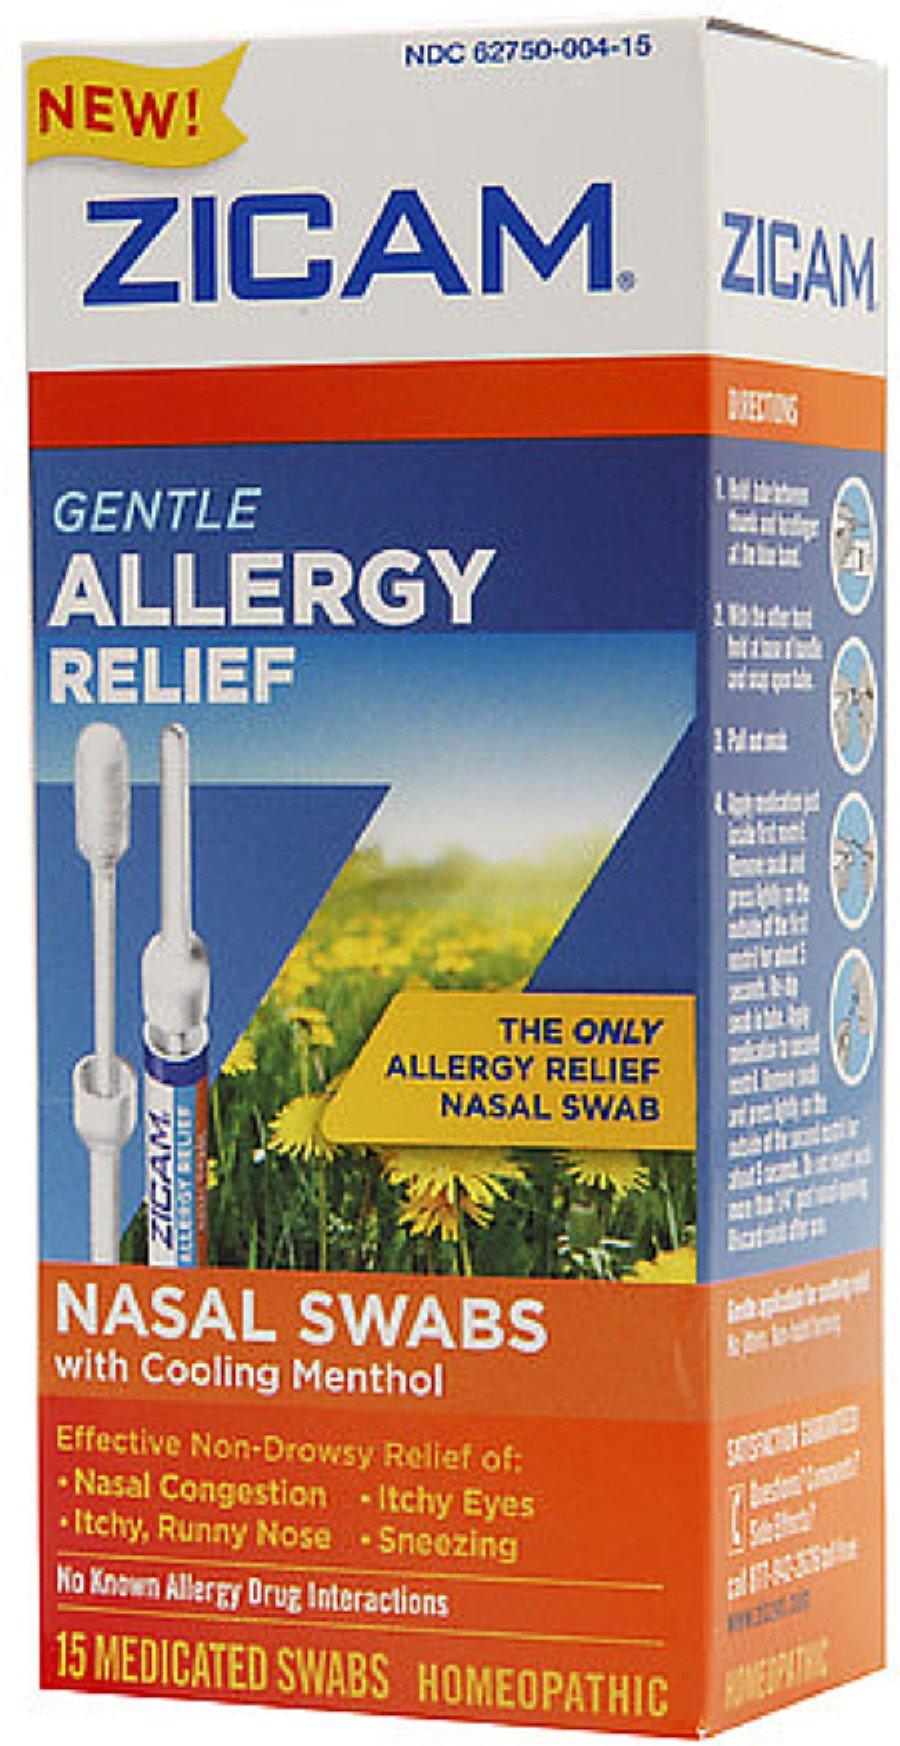 Zicam Gentle Allergy Relief Nasal Swabs with Cooling Menthol, 15 ea (Pack of 5)